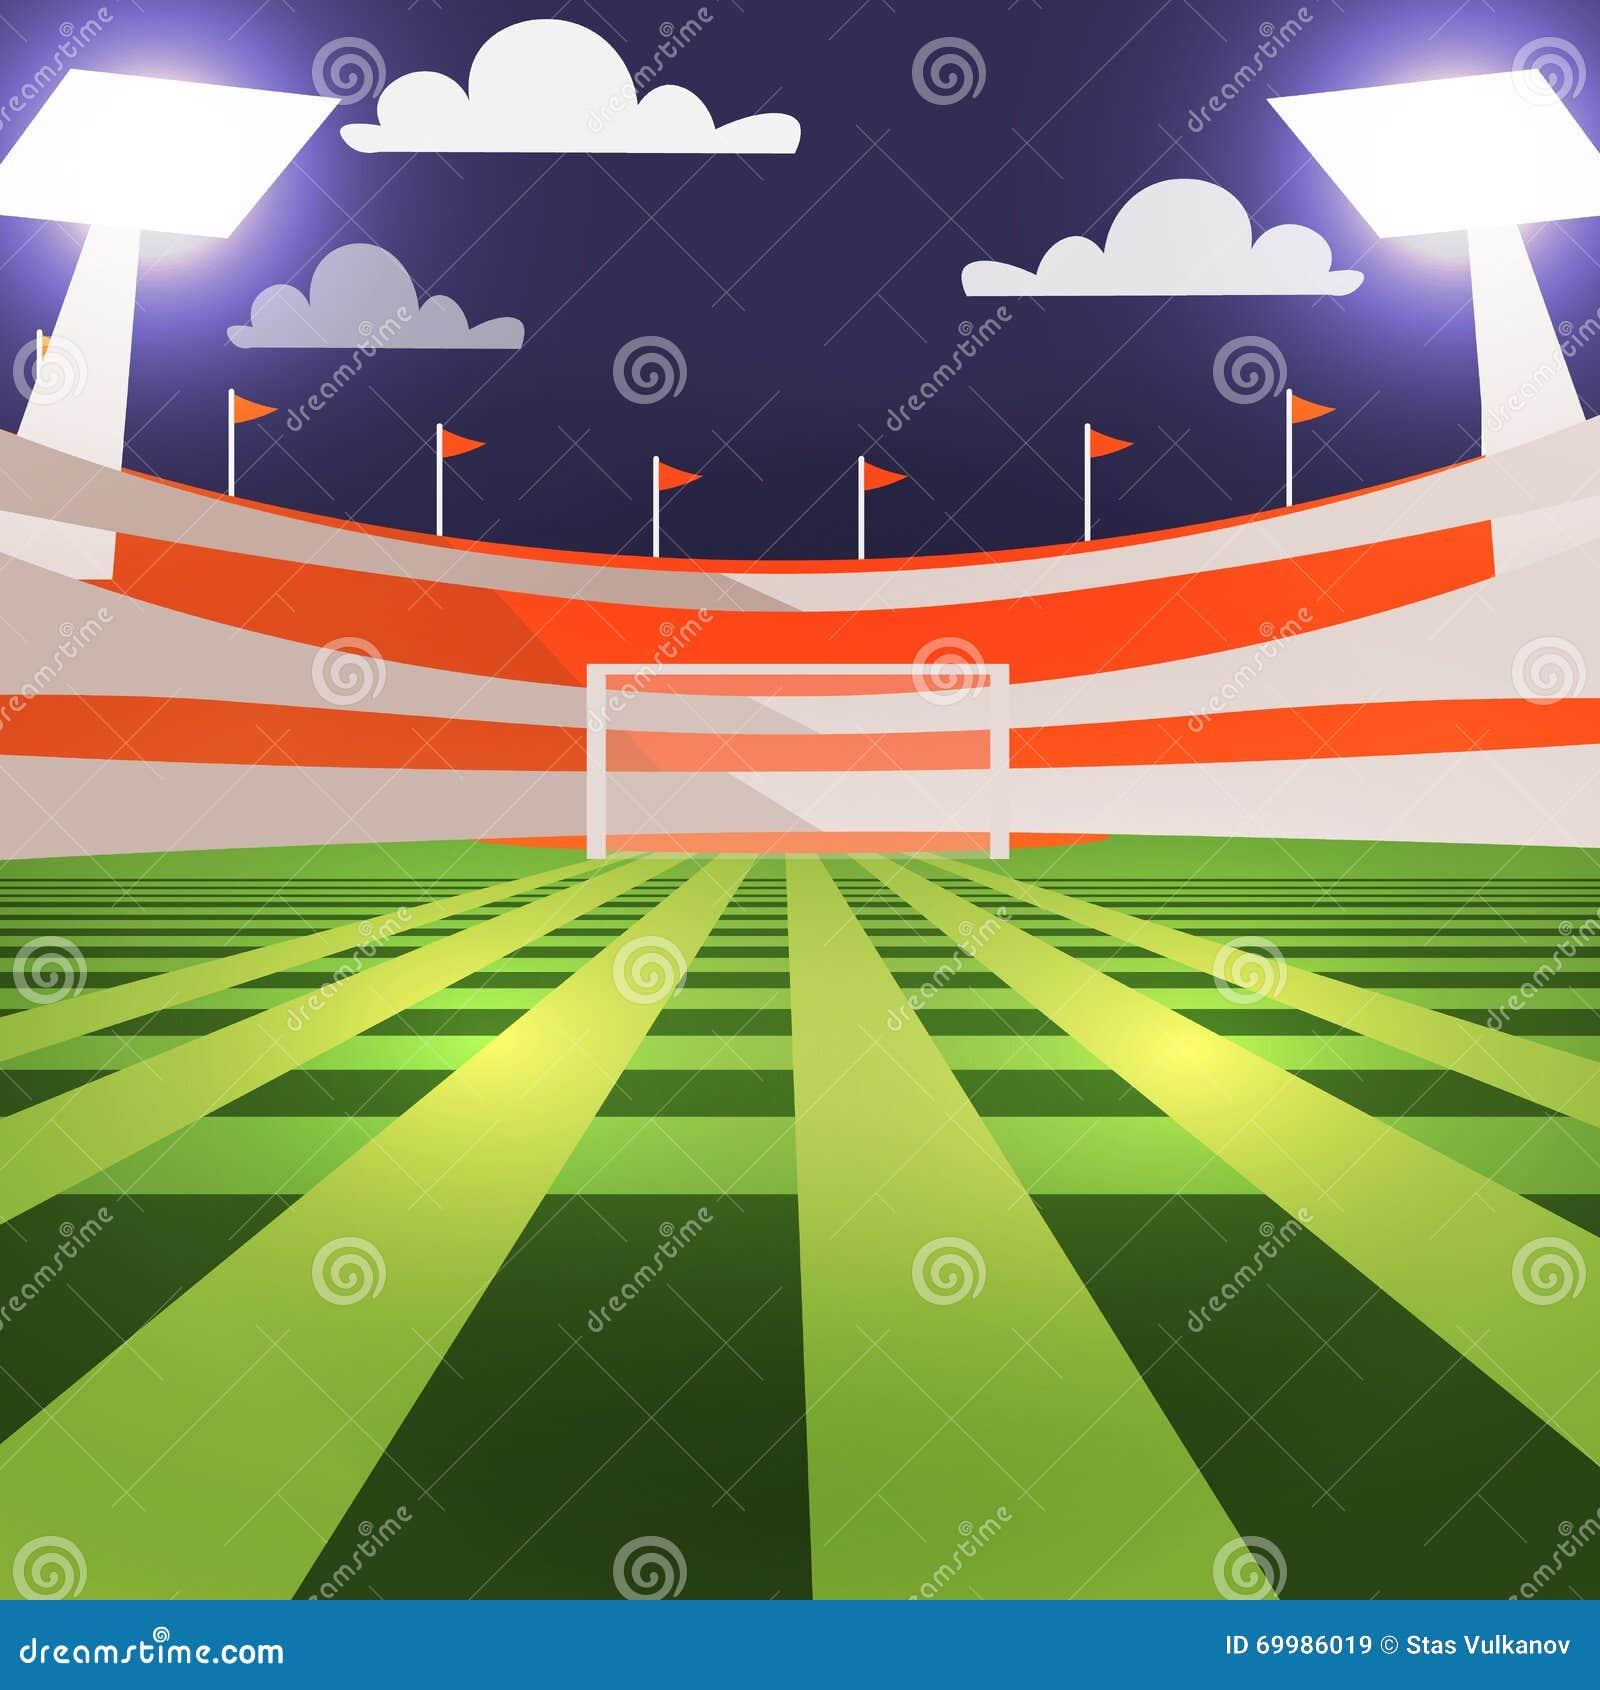 Stadium Lights Svg: Bleachers Cartoons, Illustrations & Vector Stock Images